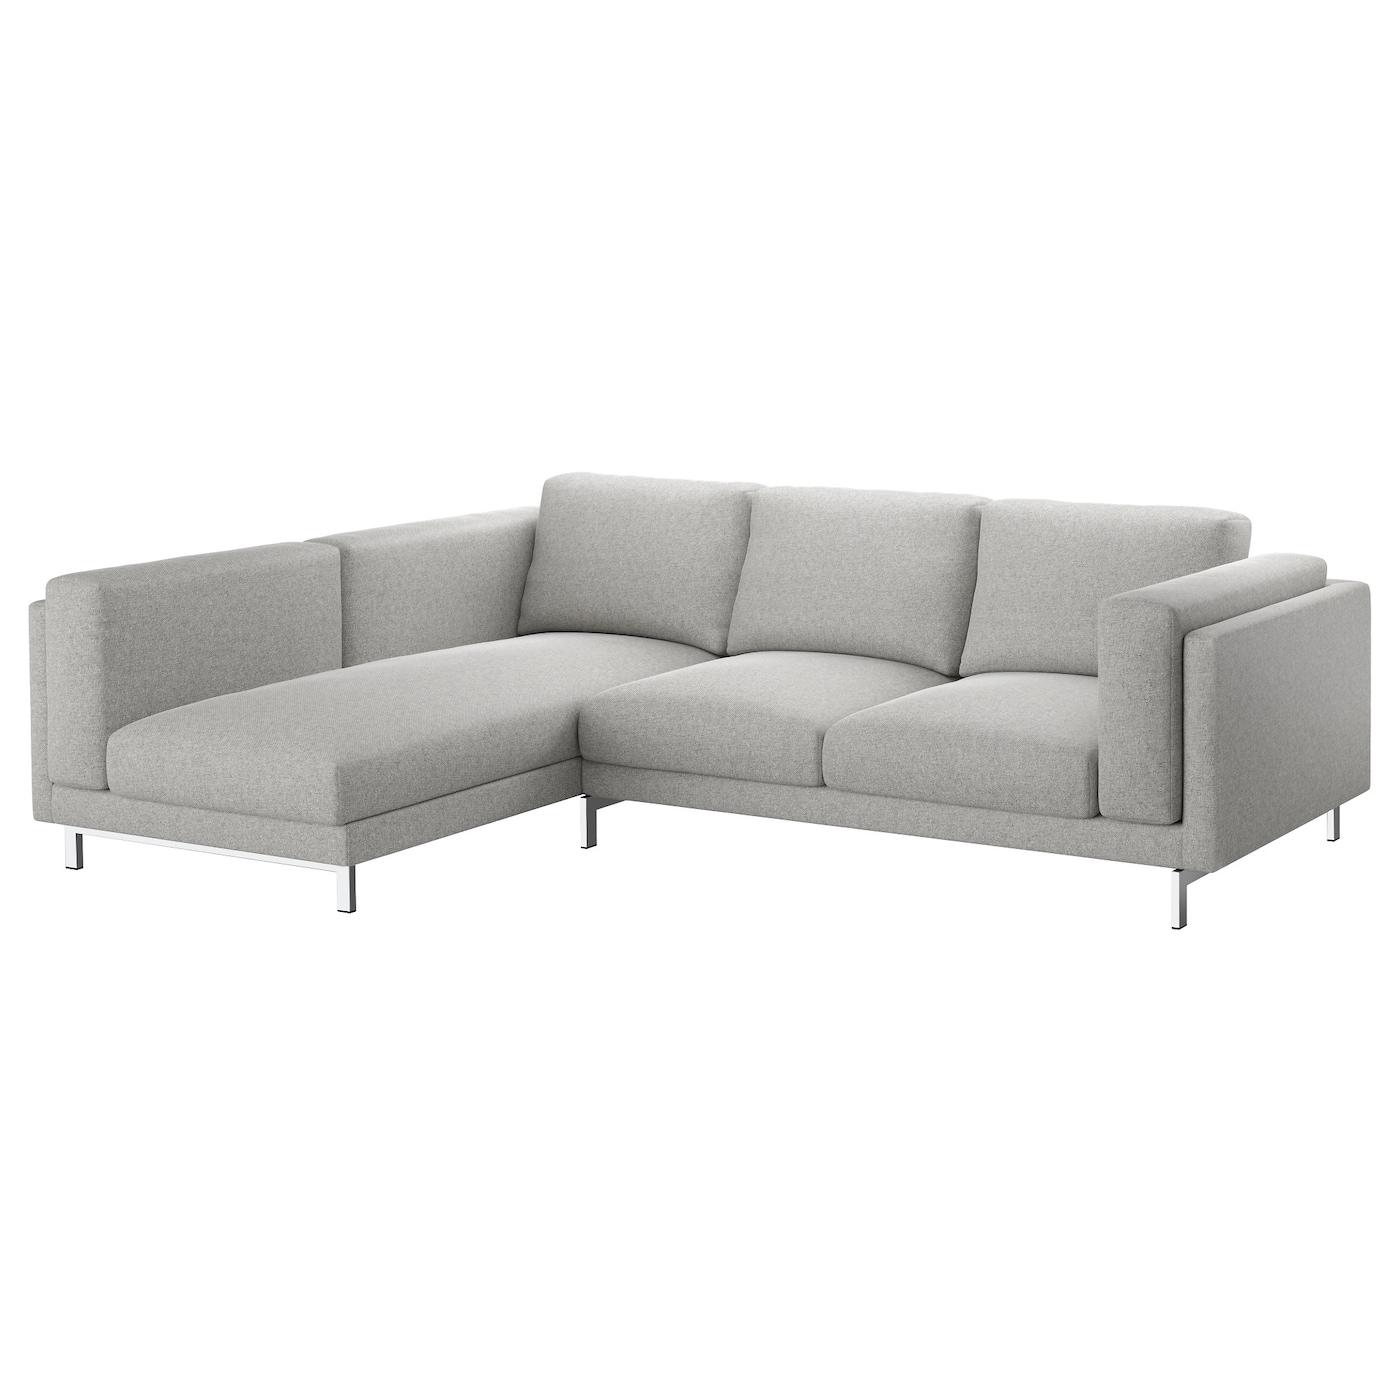 nockeby 3 seat sofa with chaise longue left tallmyra white black rh ikea com ikea chaise sofa bed ikea chaise sofa with storage